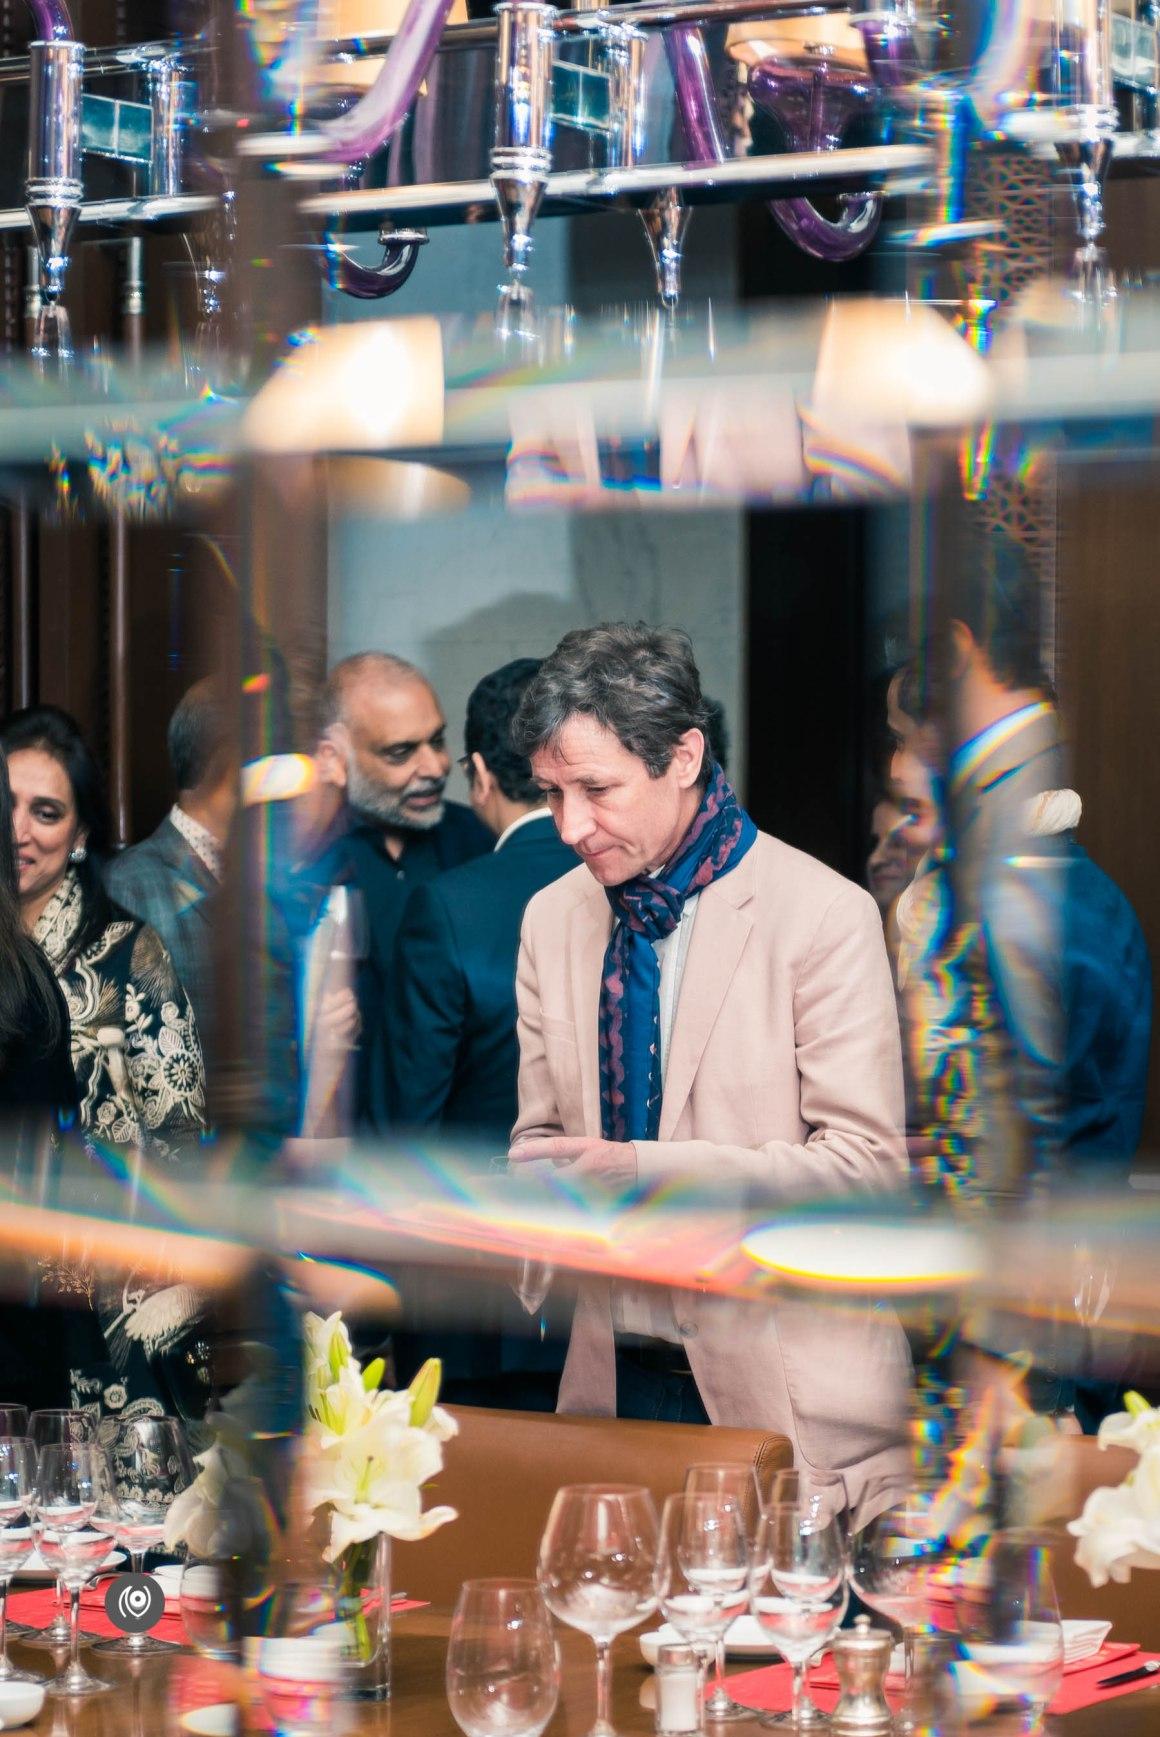 Naina.co, Naina Redhu, HTBrunch, Hindustan Times, Hindustan Times Brunch, Jamal Shaikh, Lubna Salim, The Leela Palace, Chanakyapuri, Dinner, Private Dinner, EyesForDining, Le Cirque, Chef Matteo Fontana, Siddharth Dhanvant Shanghvi, EyesForDining, EyesForLuxury, Tate, Tate Museum, Maria Balshaw, Woman Director, Subodh Gupta, Bharti Kher, Meru Gokhale, Penguin Random House, Nick Merriman, Hari Bhartia, Dattaraj Salgaocar, Patrick French, Arun Saraf, Kavita Bhartia, Art, Photographer Life, Lifestyle Photographer India, Luxury Photographer India, Food Photographer India, Lifestyle Blogger India, Luxury Blogger India, Food Blogger India